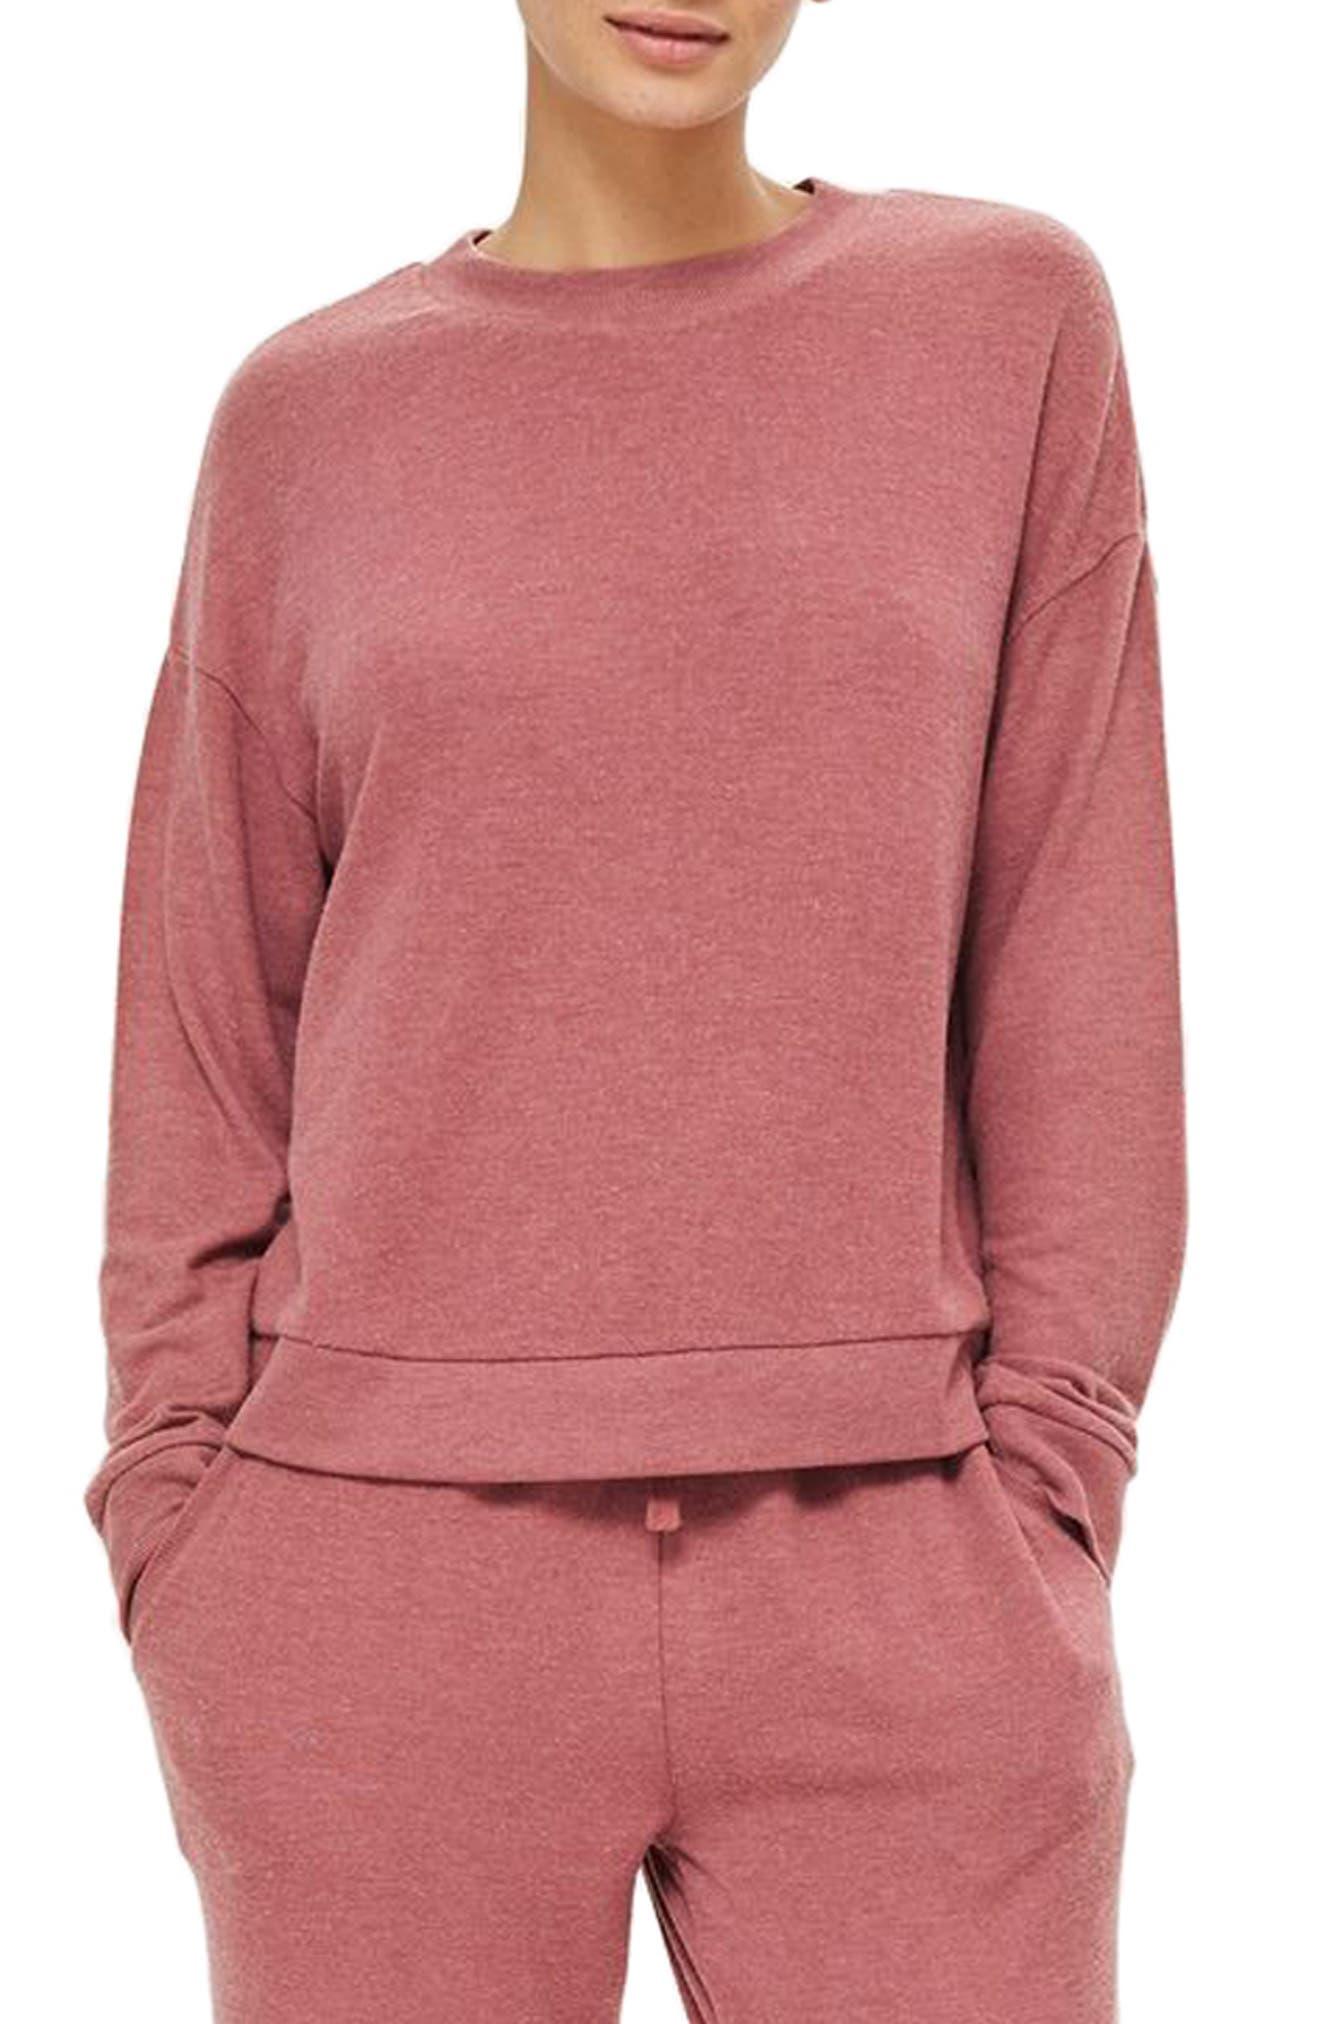 Topshop Rose Sweatshirt